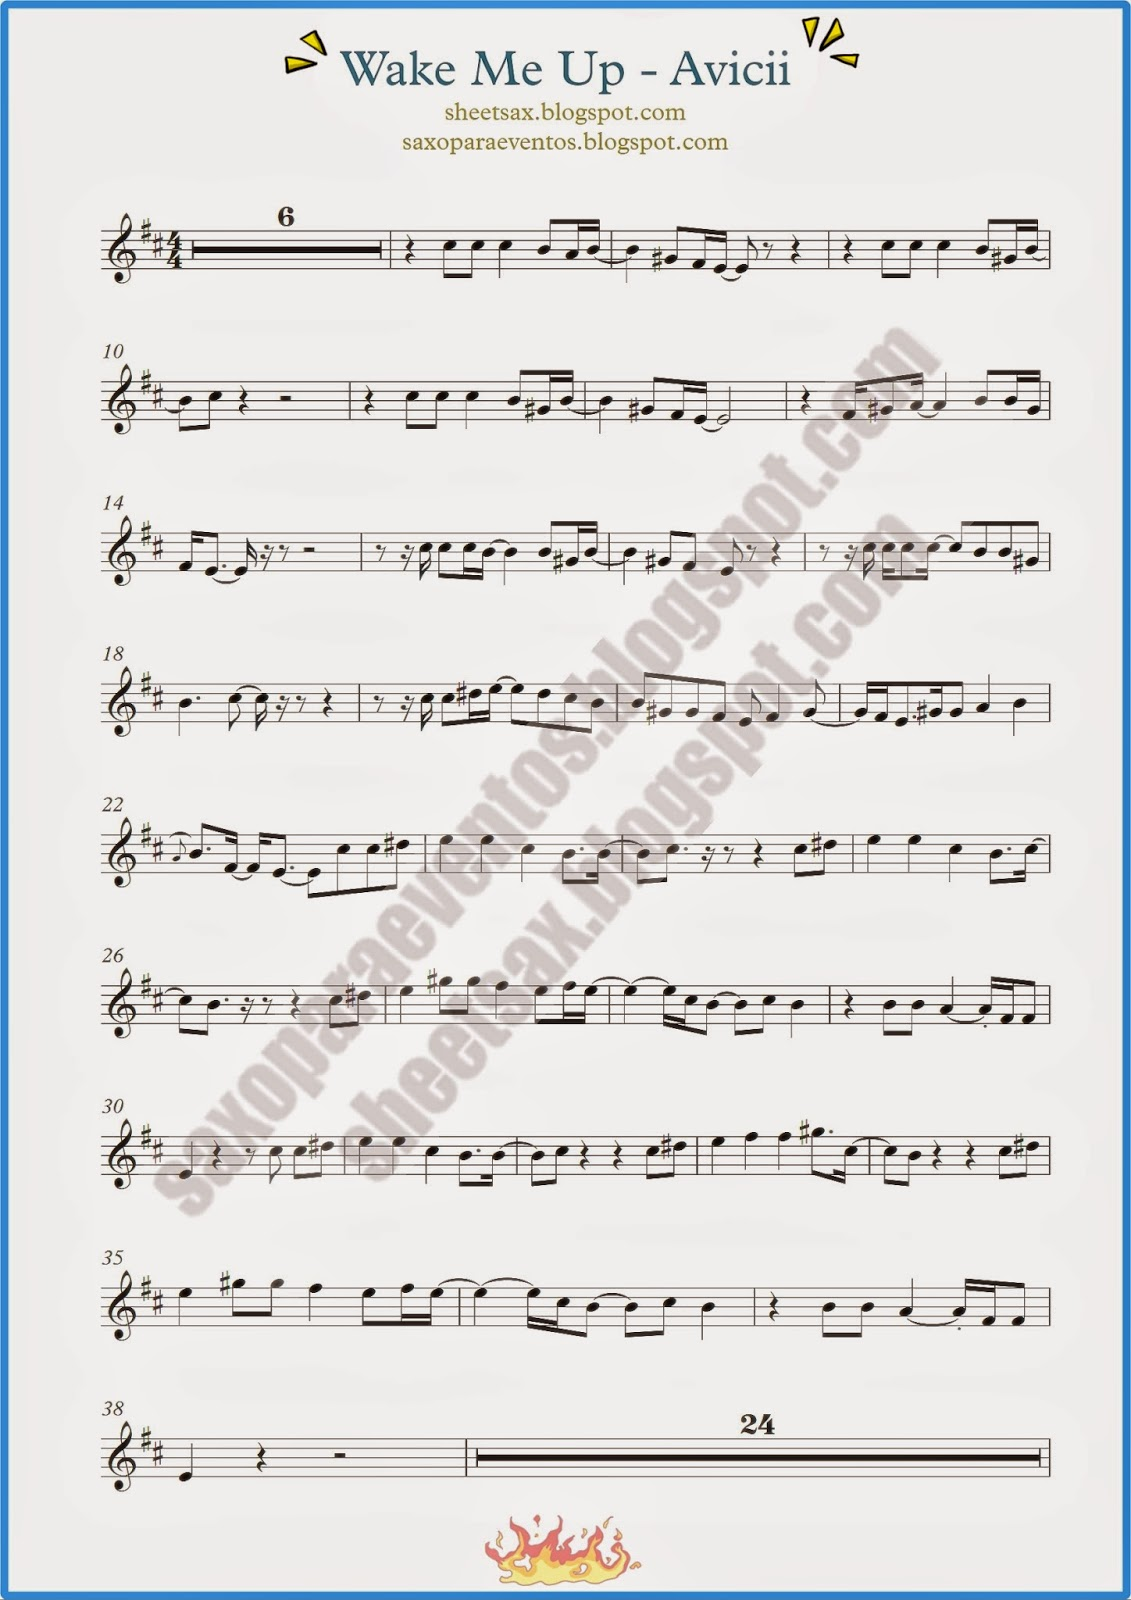 Wake me up by avicii sheet music and playalong for your wake me up by avicii sheet music and playalong for your instrument free sheet music for sax hexwebz Gallery